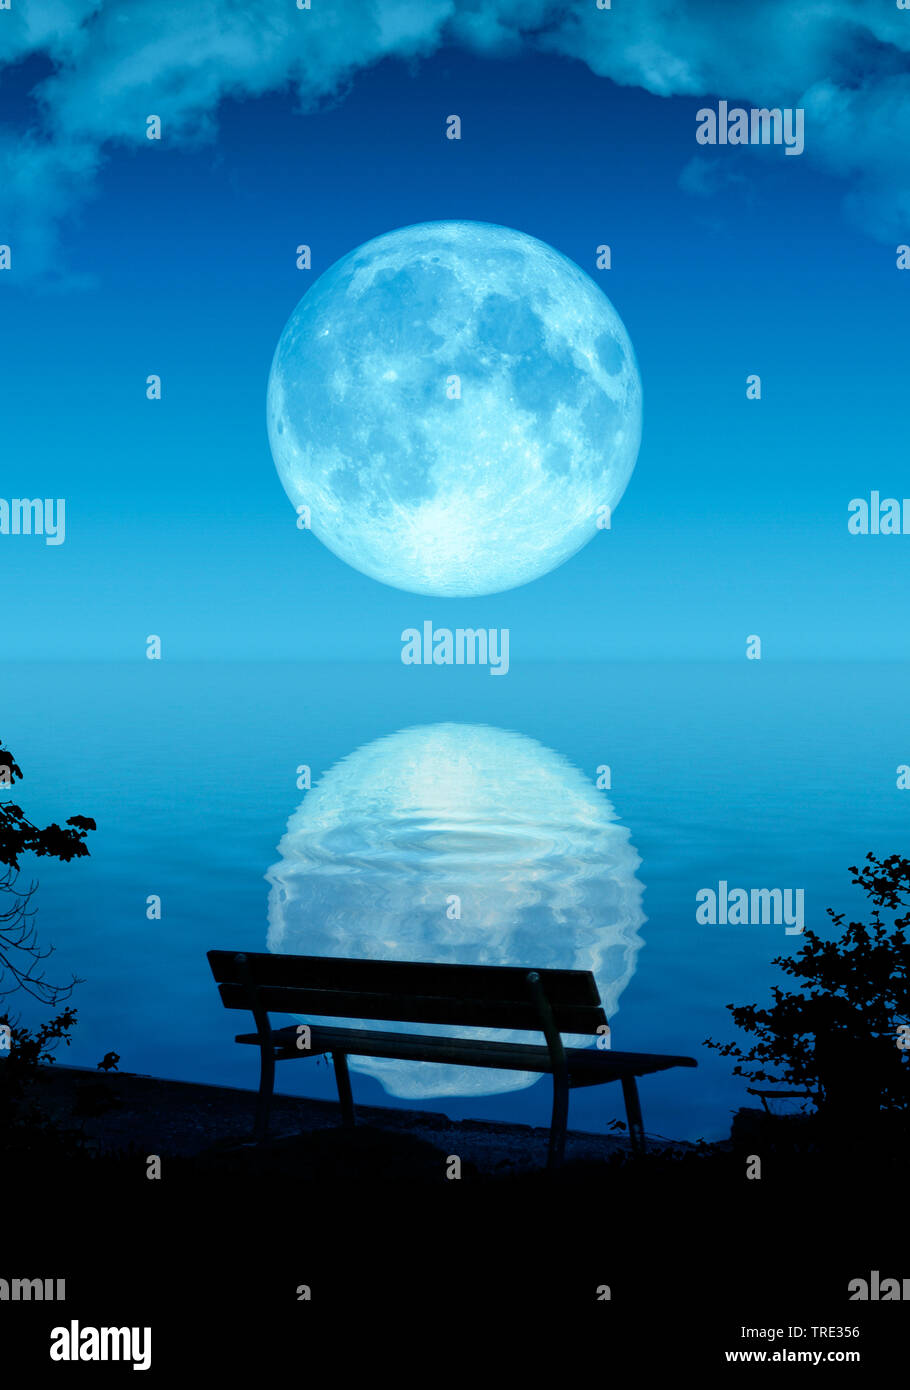 Bank am Meer, Vollmond spiegelt sich im Wasser, Computergraphik   illustration of a nice full moon   BLWS515952.jpg [ (c) blickwinkel/McPHOTO/M. Gann - Stock Image